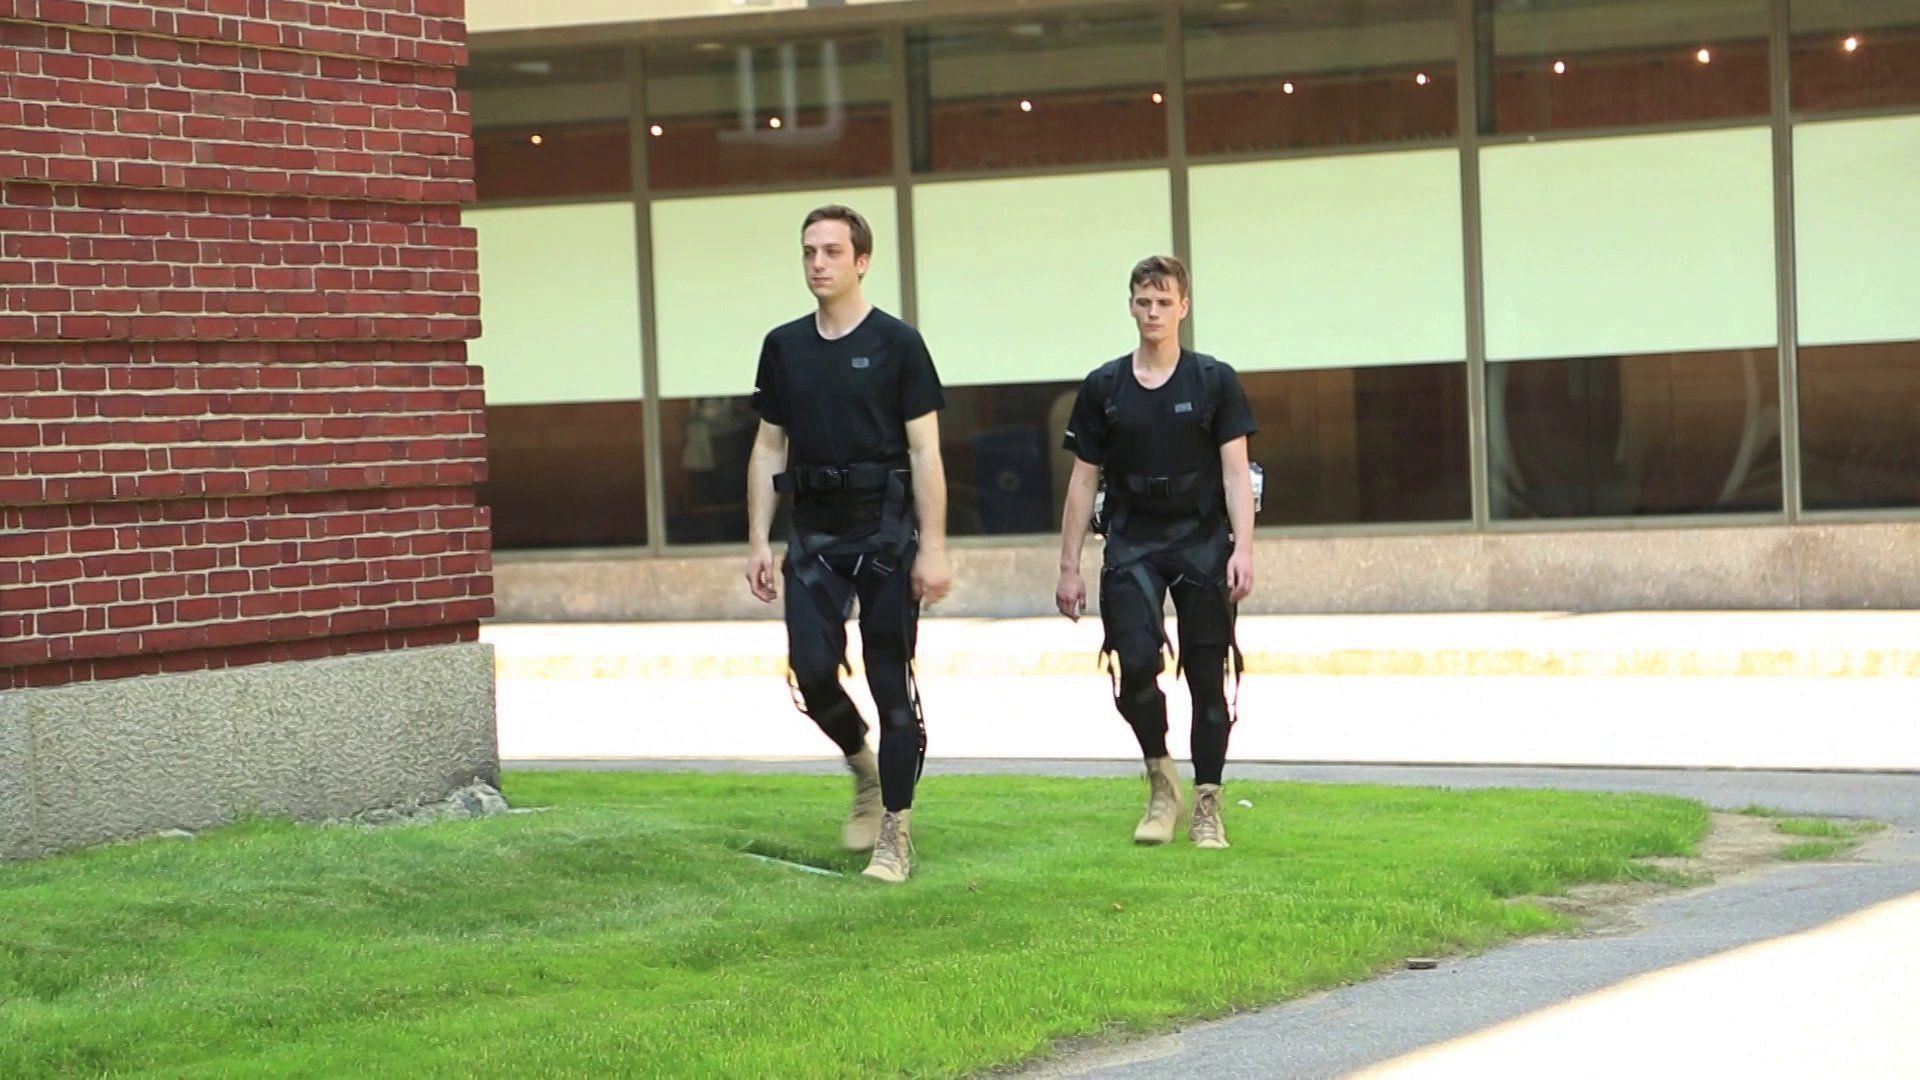 Harvard and DARPA build fabric-based robotic exoskeleton